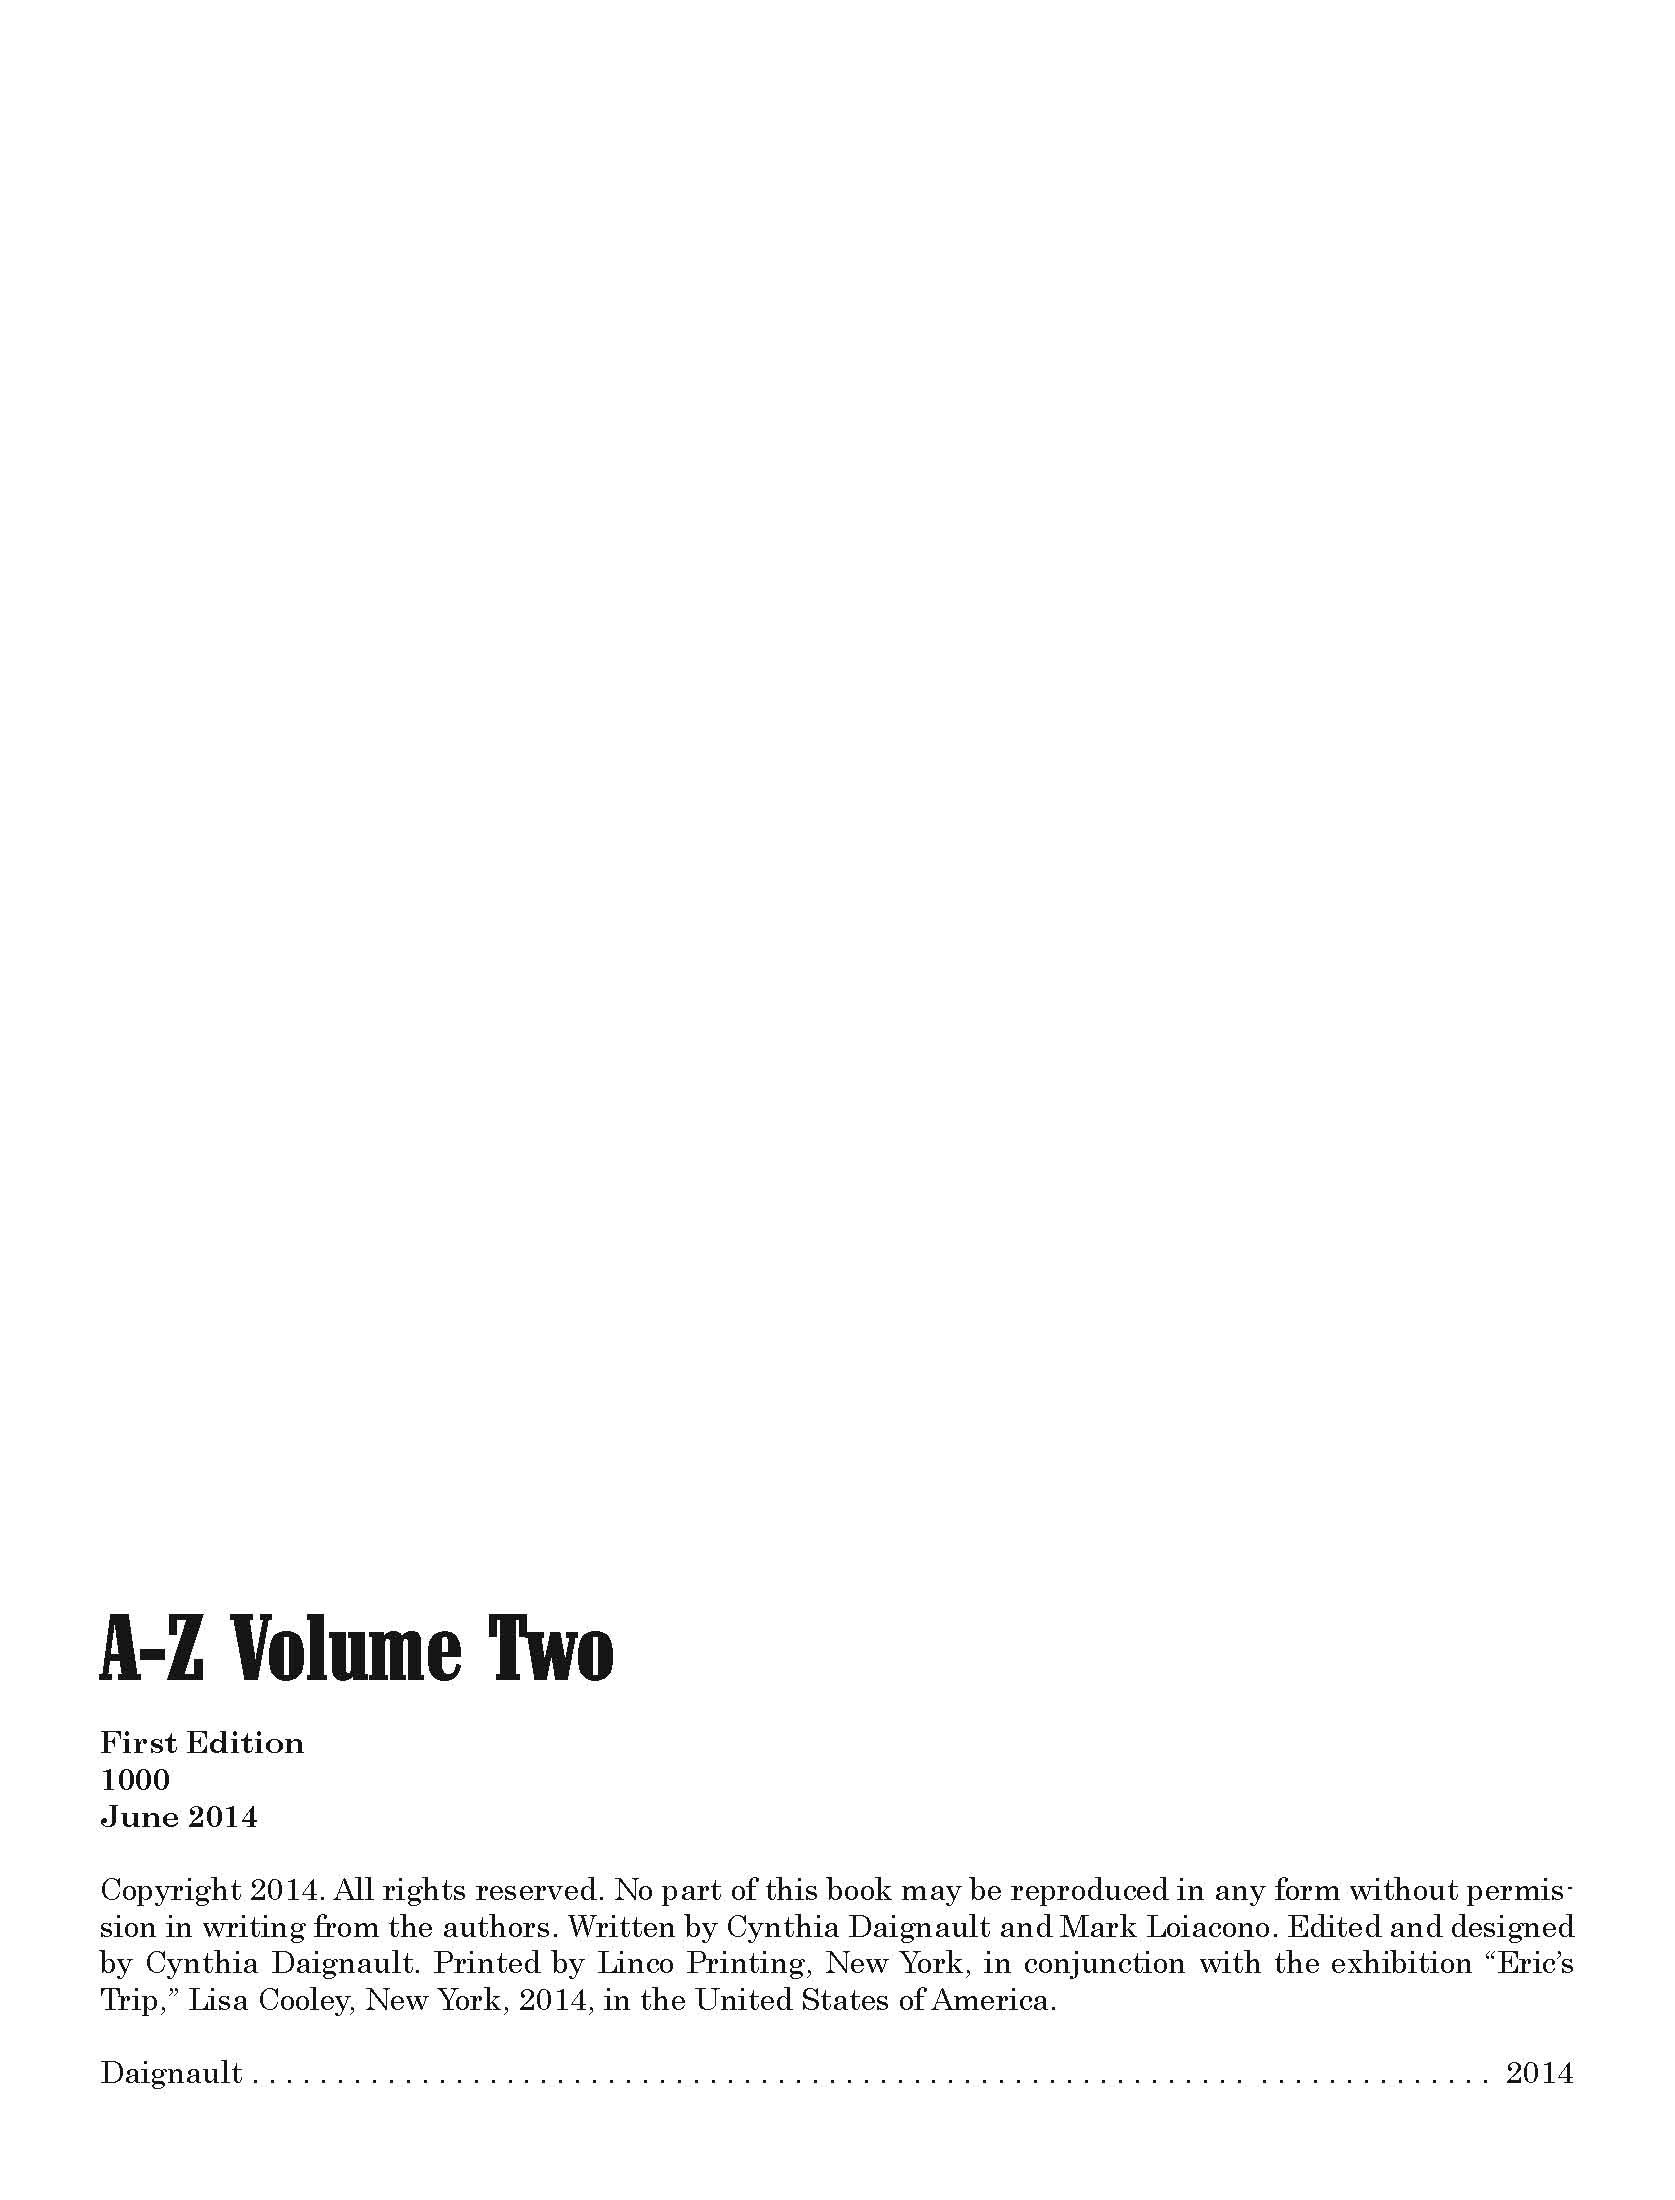 AZ_Vol2_2014_Page_02.jpg